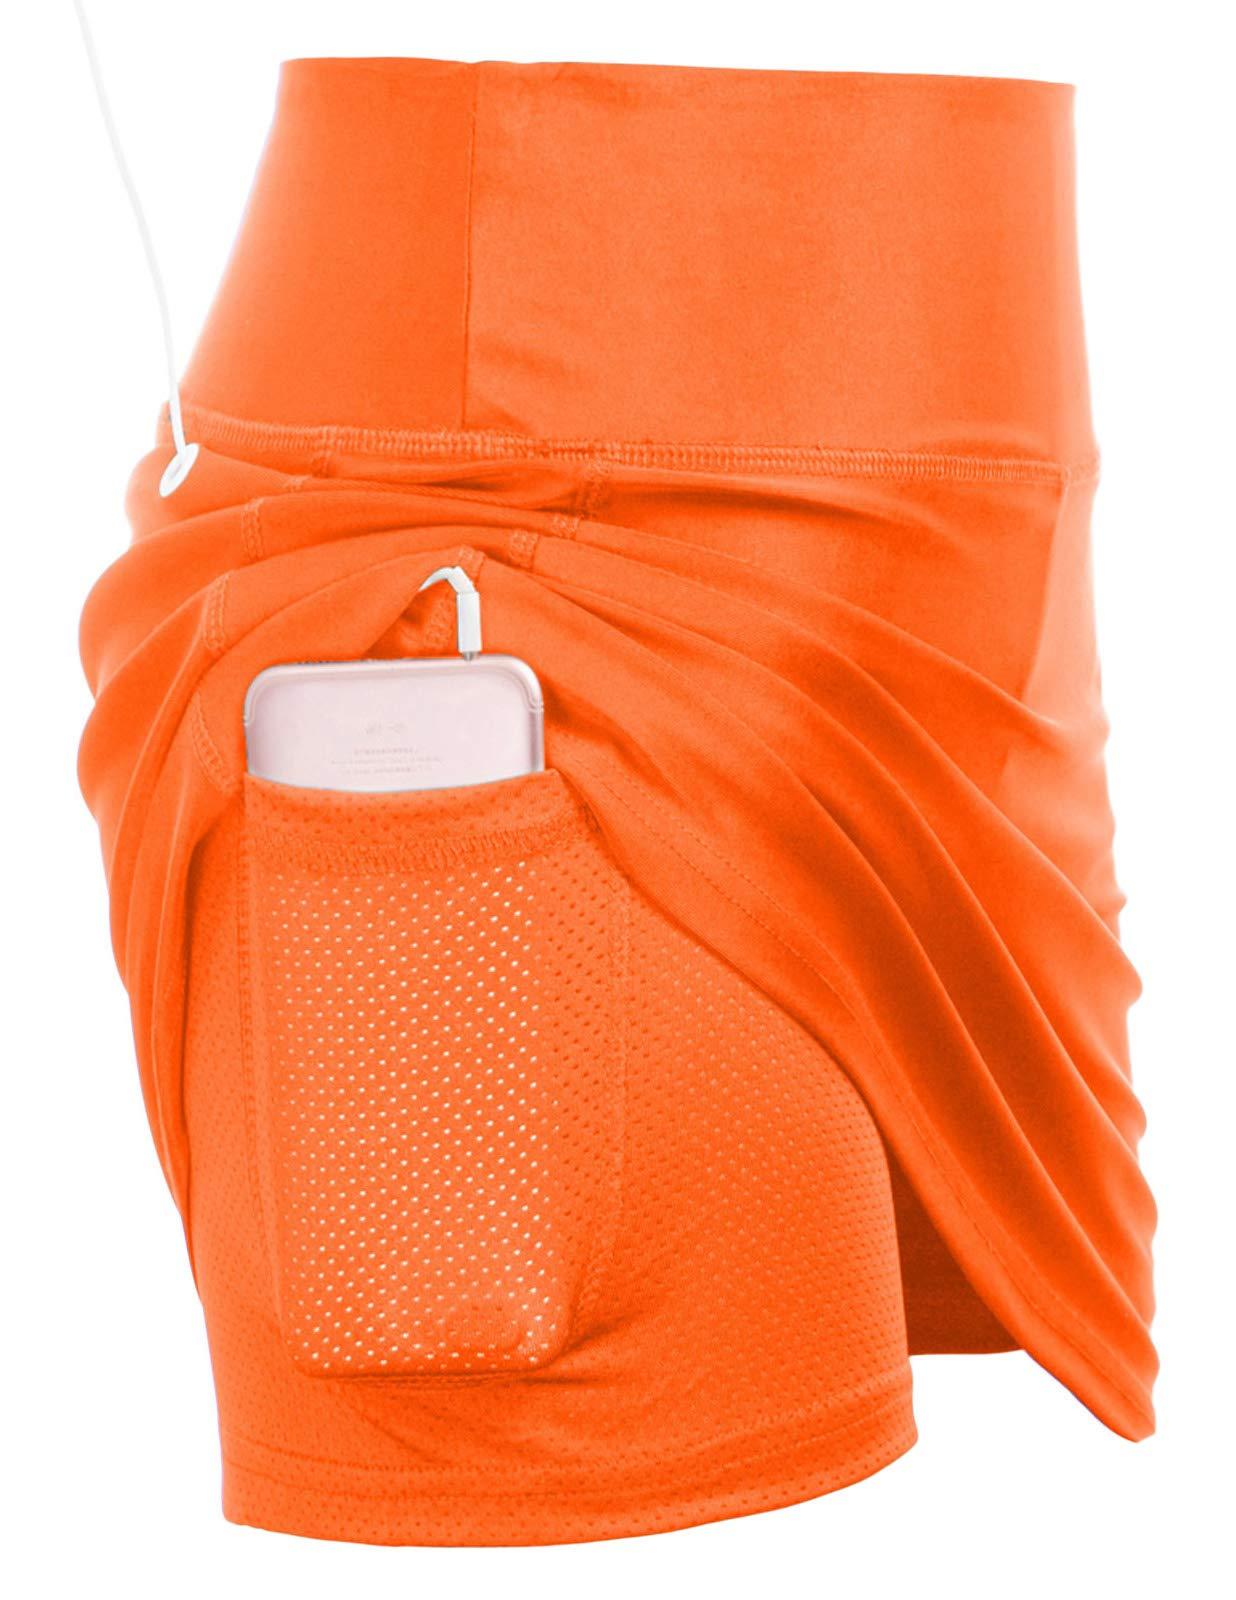 JACK SMITH Women's Everyday Casual Athletic Skort with Bike Shorts(XL,Orange) by JACK SMITH